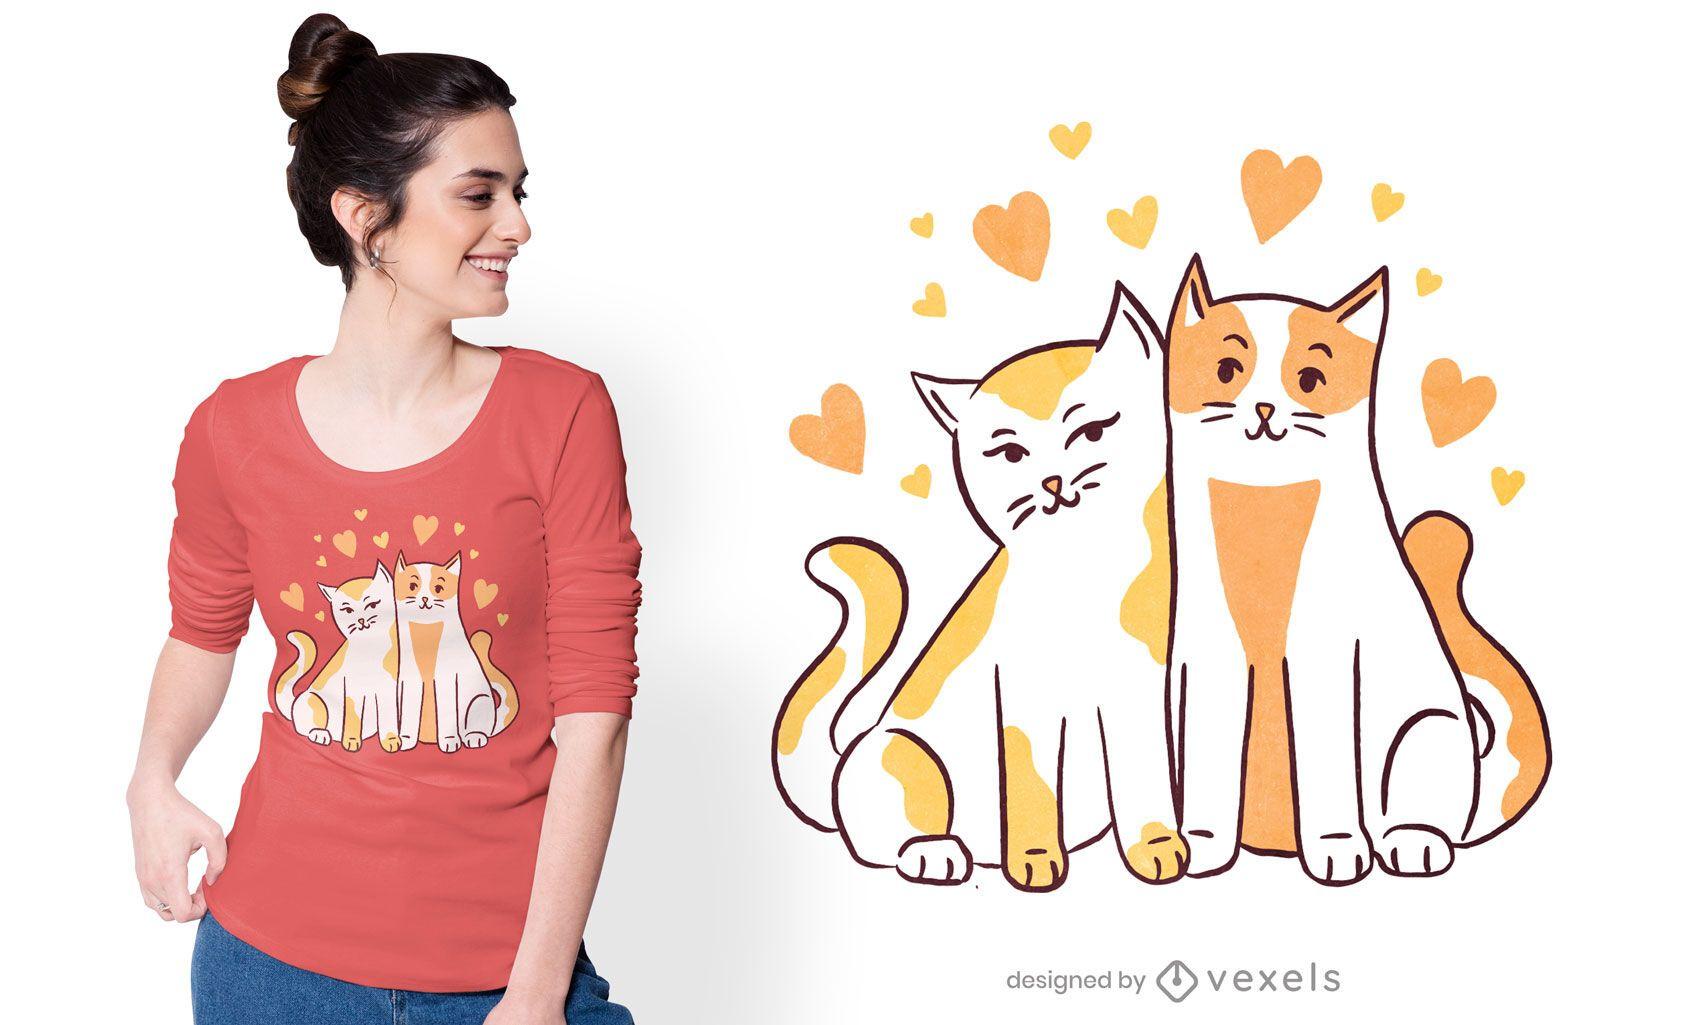 Dise?o de camiseta de gatos enamorados.